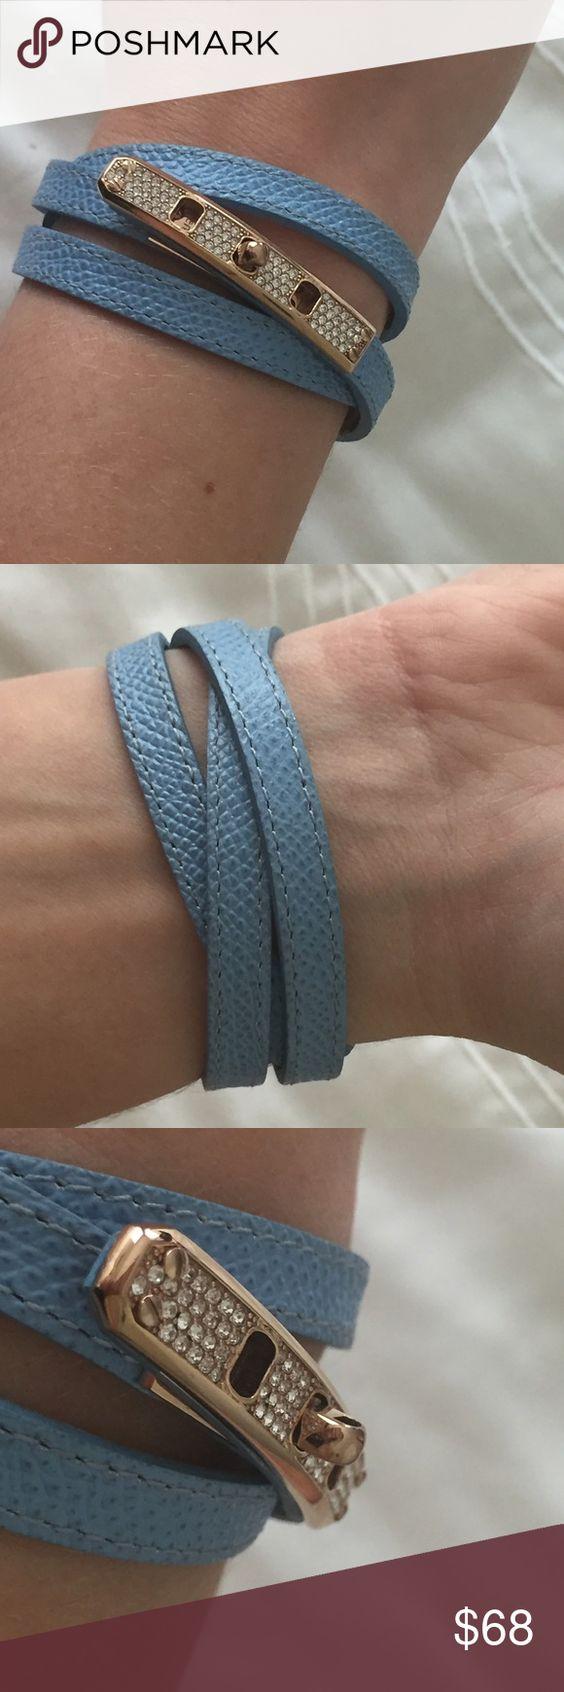 Henri Bendel wrap bracelet Light blue saffiano leather wrap bracelet. Turn-lock closure with clear Swarovski crystals in a rose gold plated setting. henri bendel Jewelry Bracelets